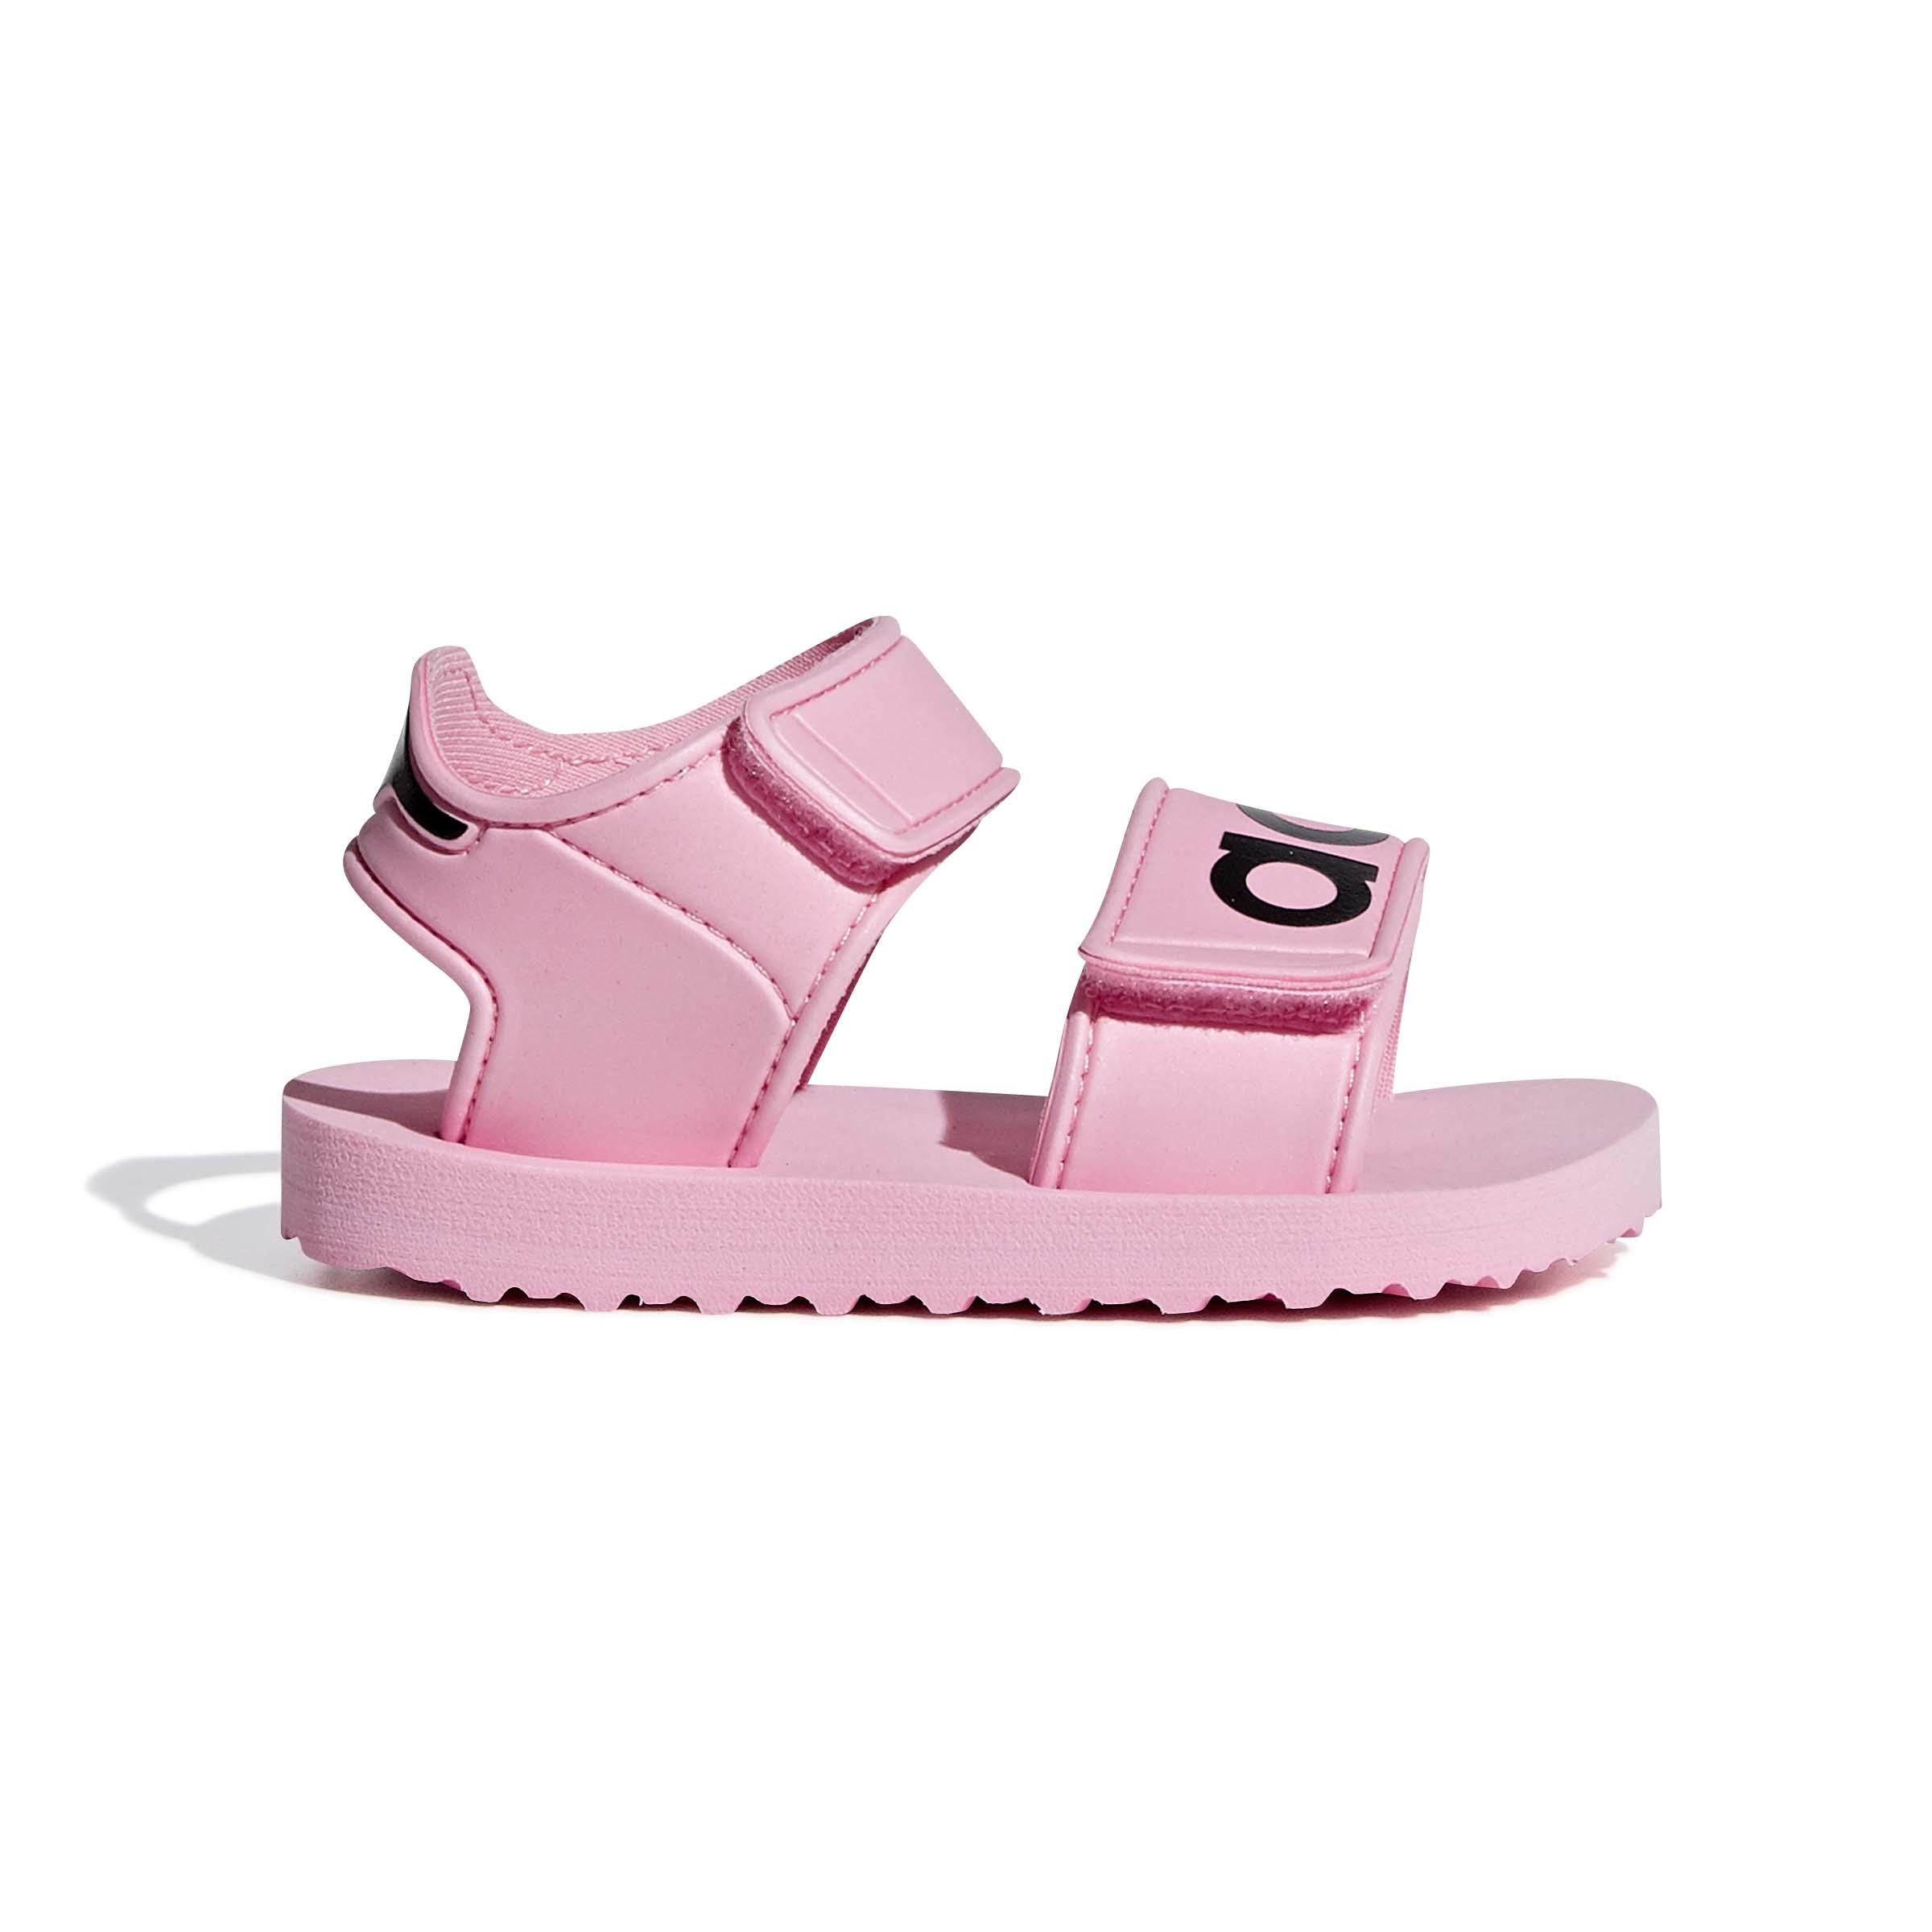 Adidas תינוקות - סנדל ורוד